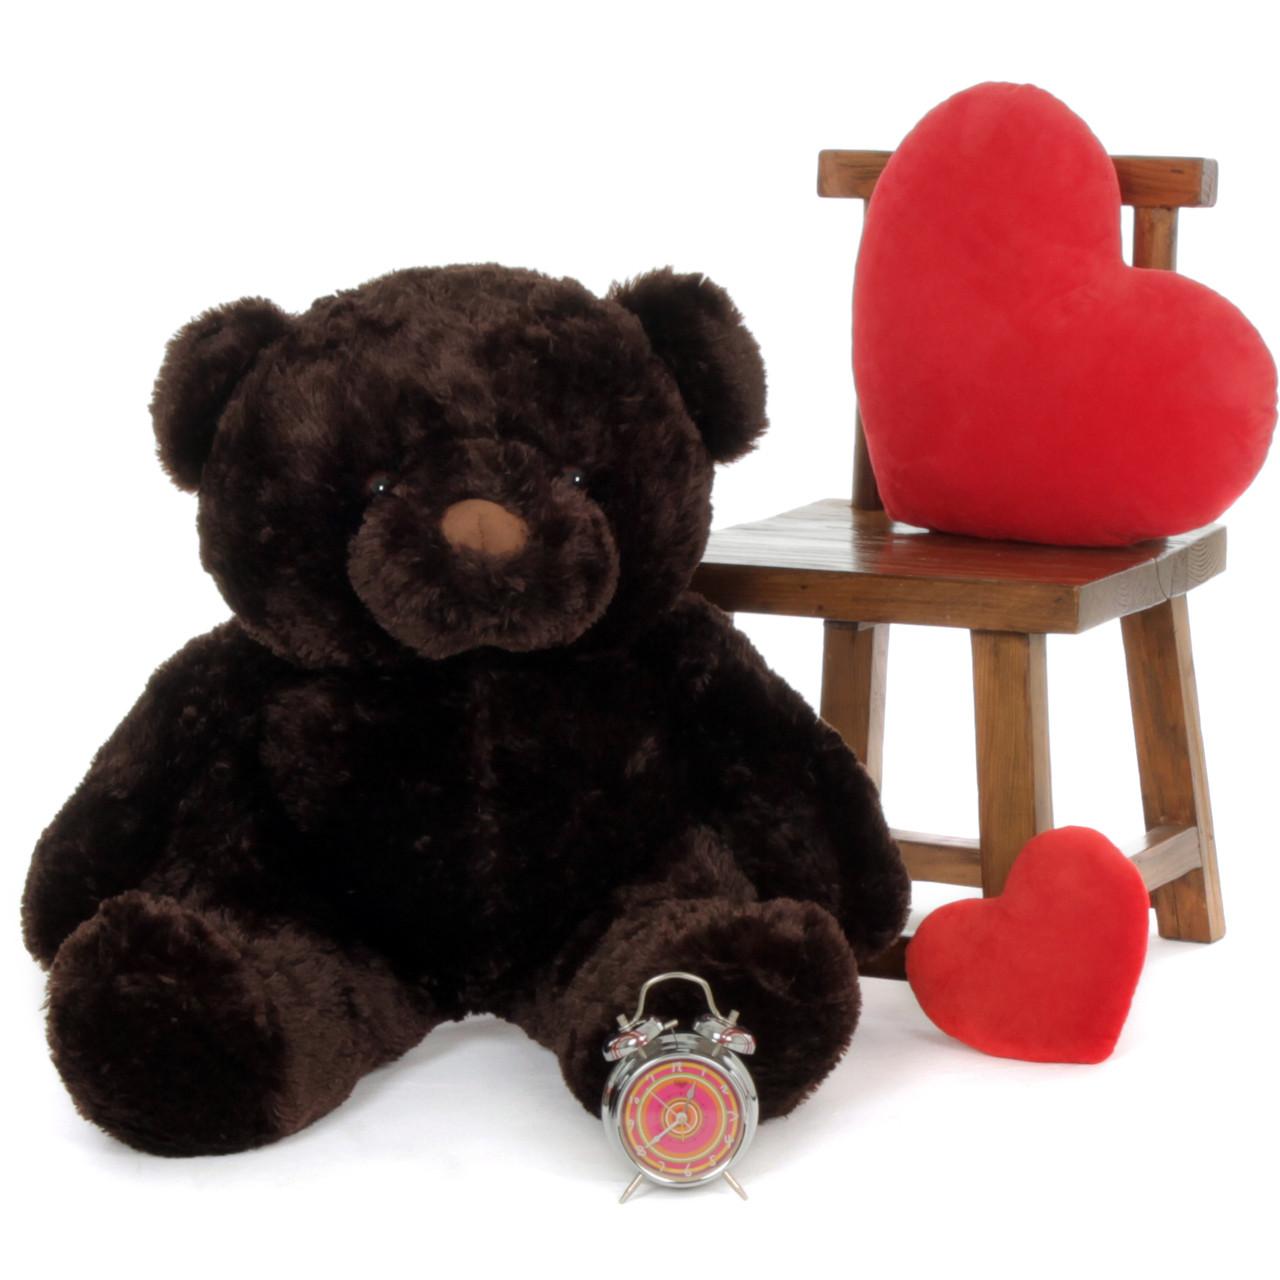 Big Dark Brown Teddy Bear Munchkin Chubs 38in